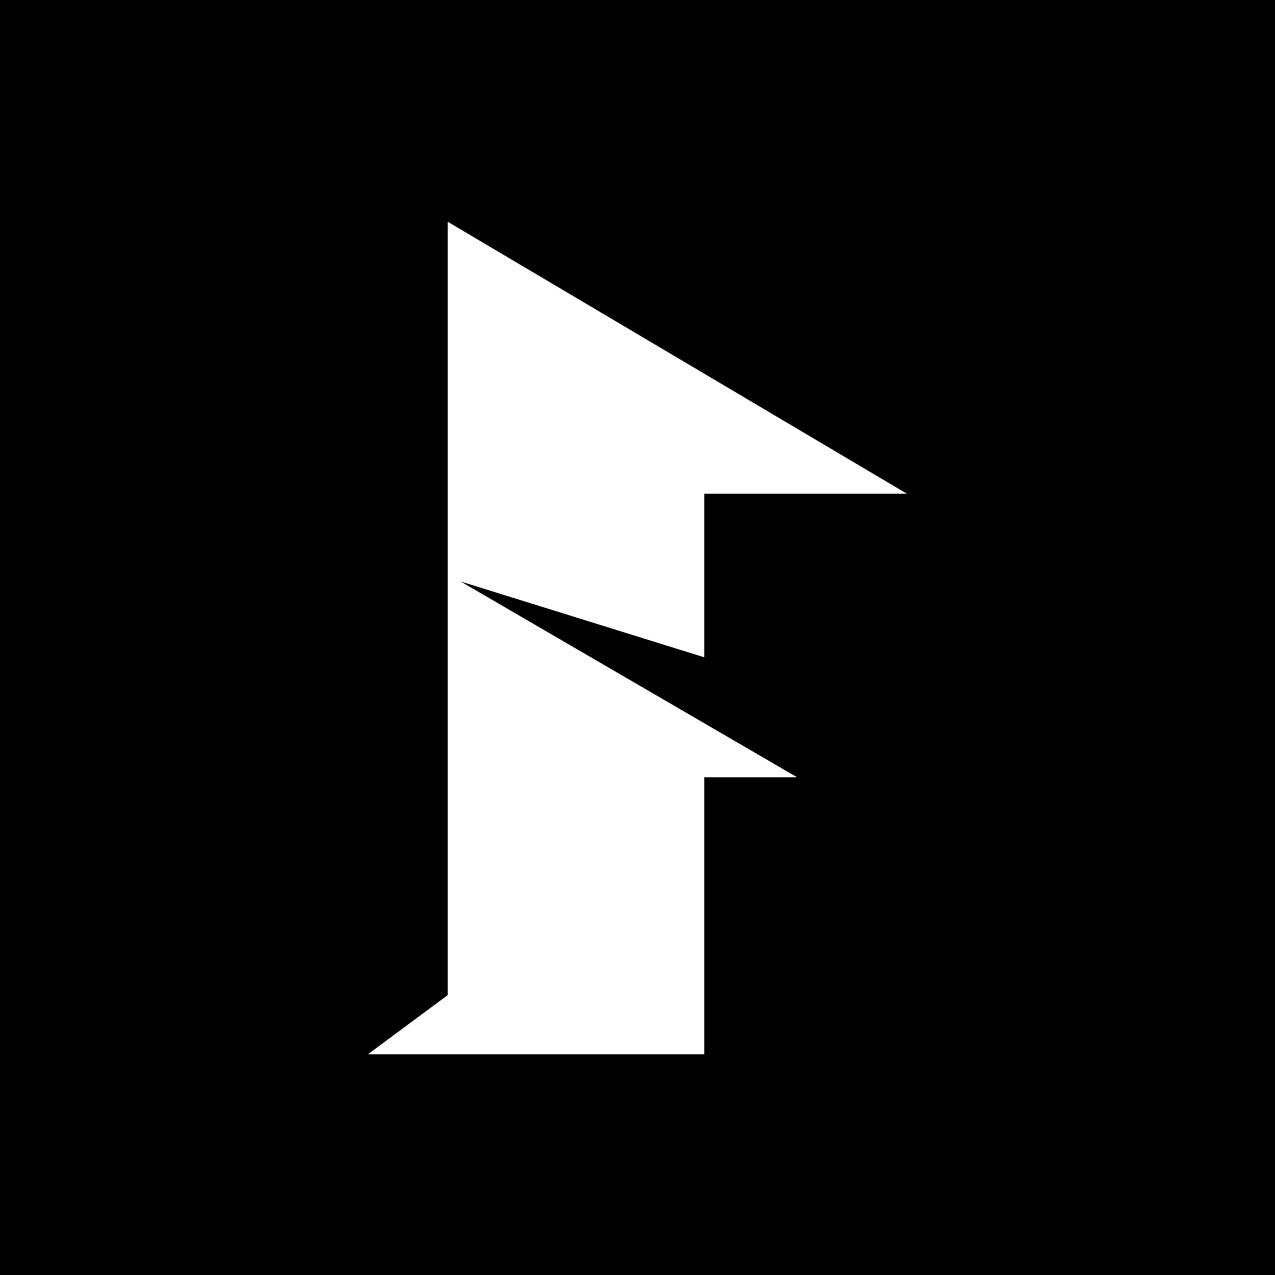 Letter F9 design by Furia